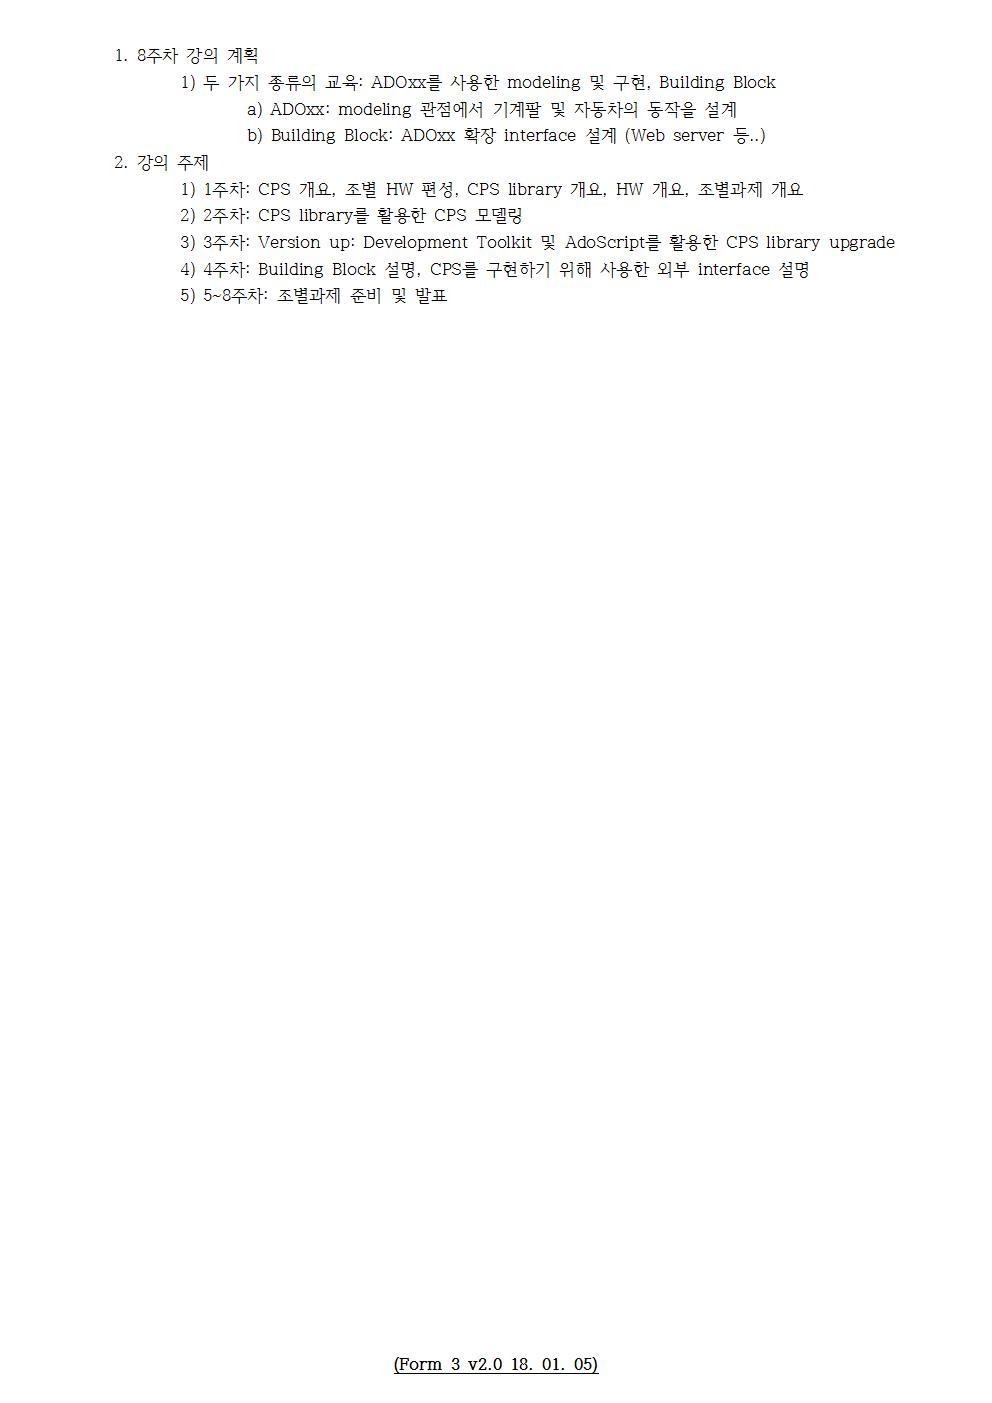 D-[18-040-RC-09]-[SWD-ADOxx Project]-[2018-05-24][SH]002.jpg